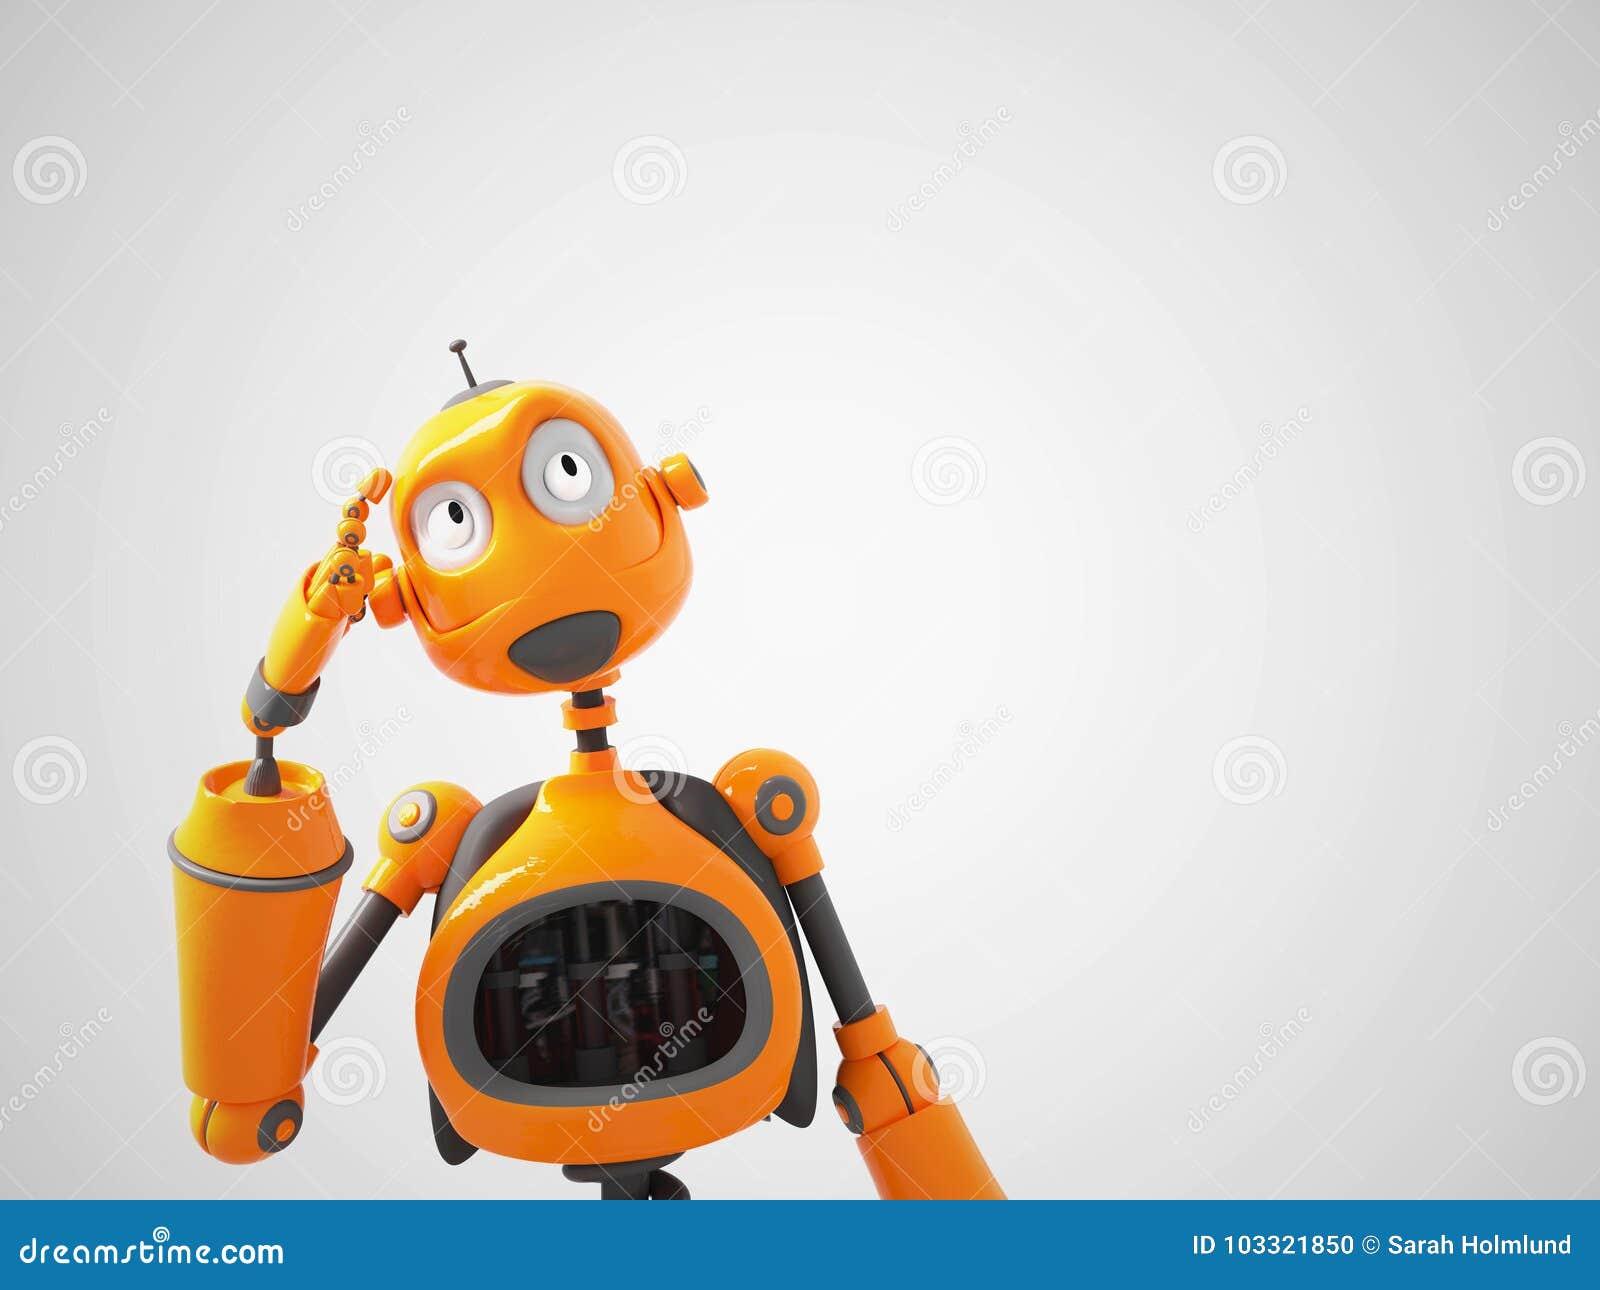 Yellow Cartoon Robot Thinking About Something Stock Illustration